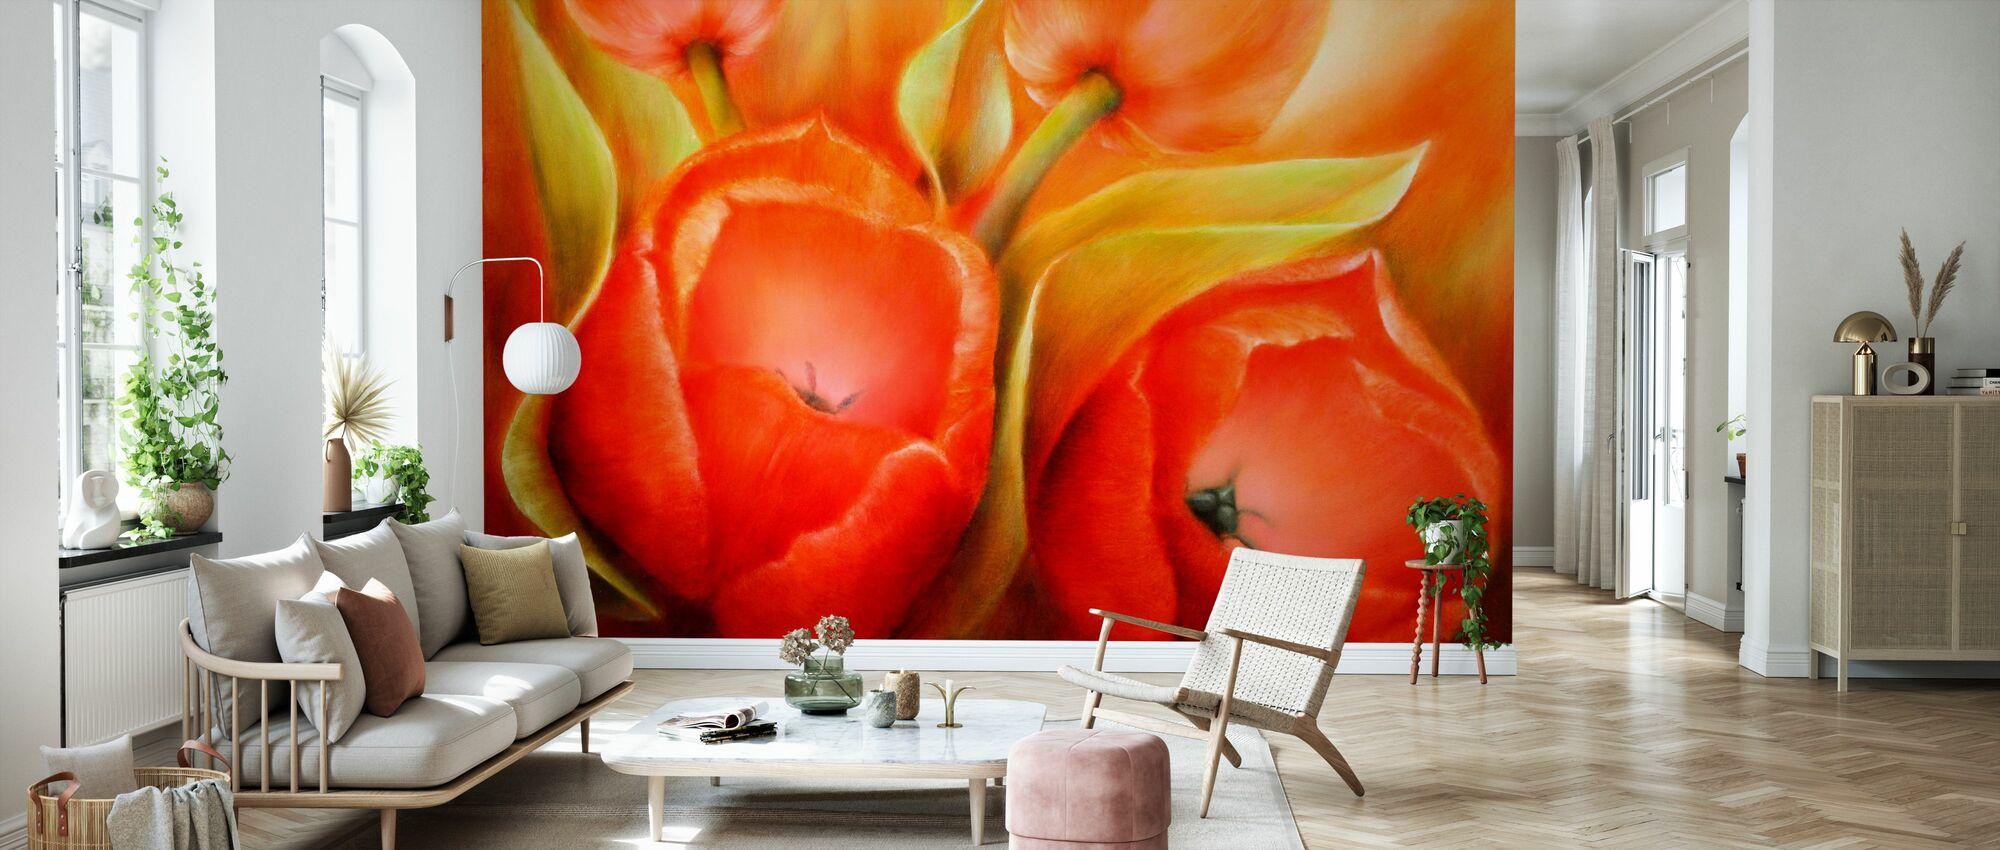 Finally Spring Again - Wallpaper - Living Room